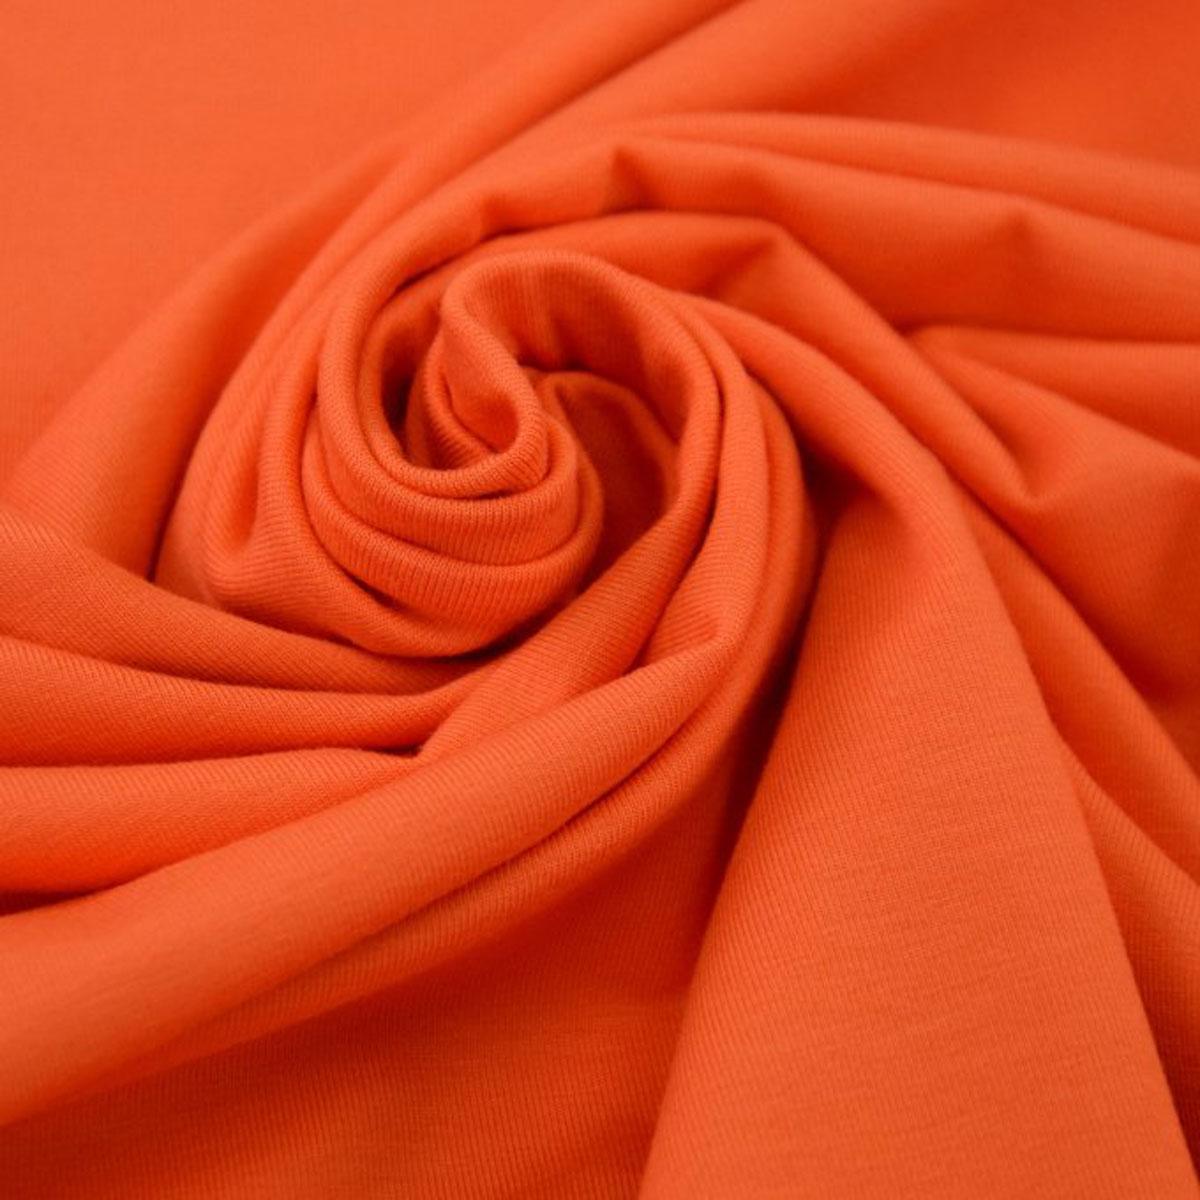 Baumwolljersey uni Meterware orange 5013